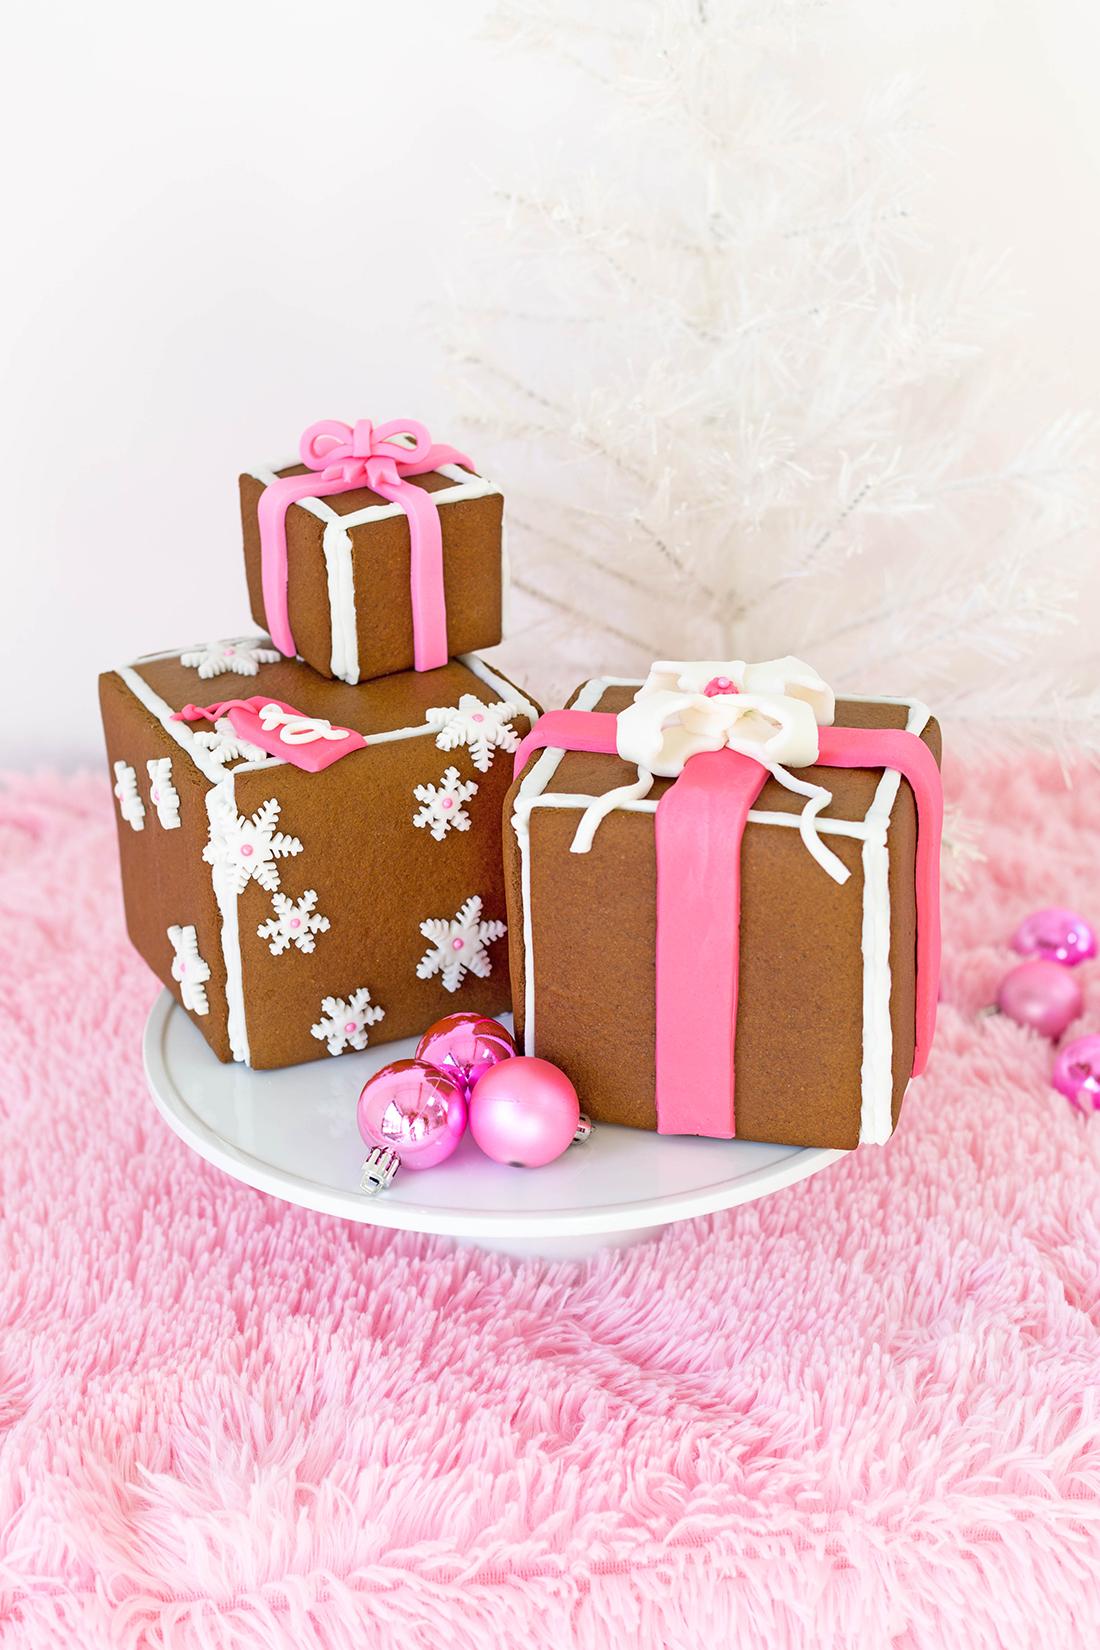 6-GingerbreadPresentStack.jpg